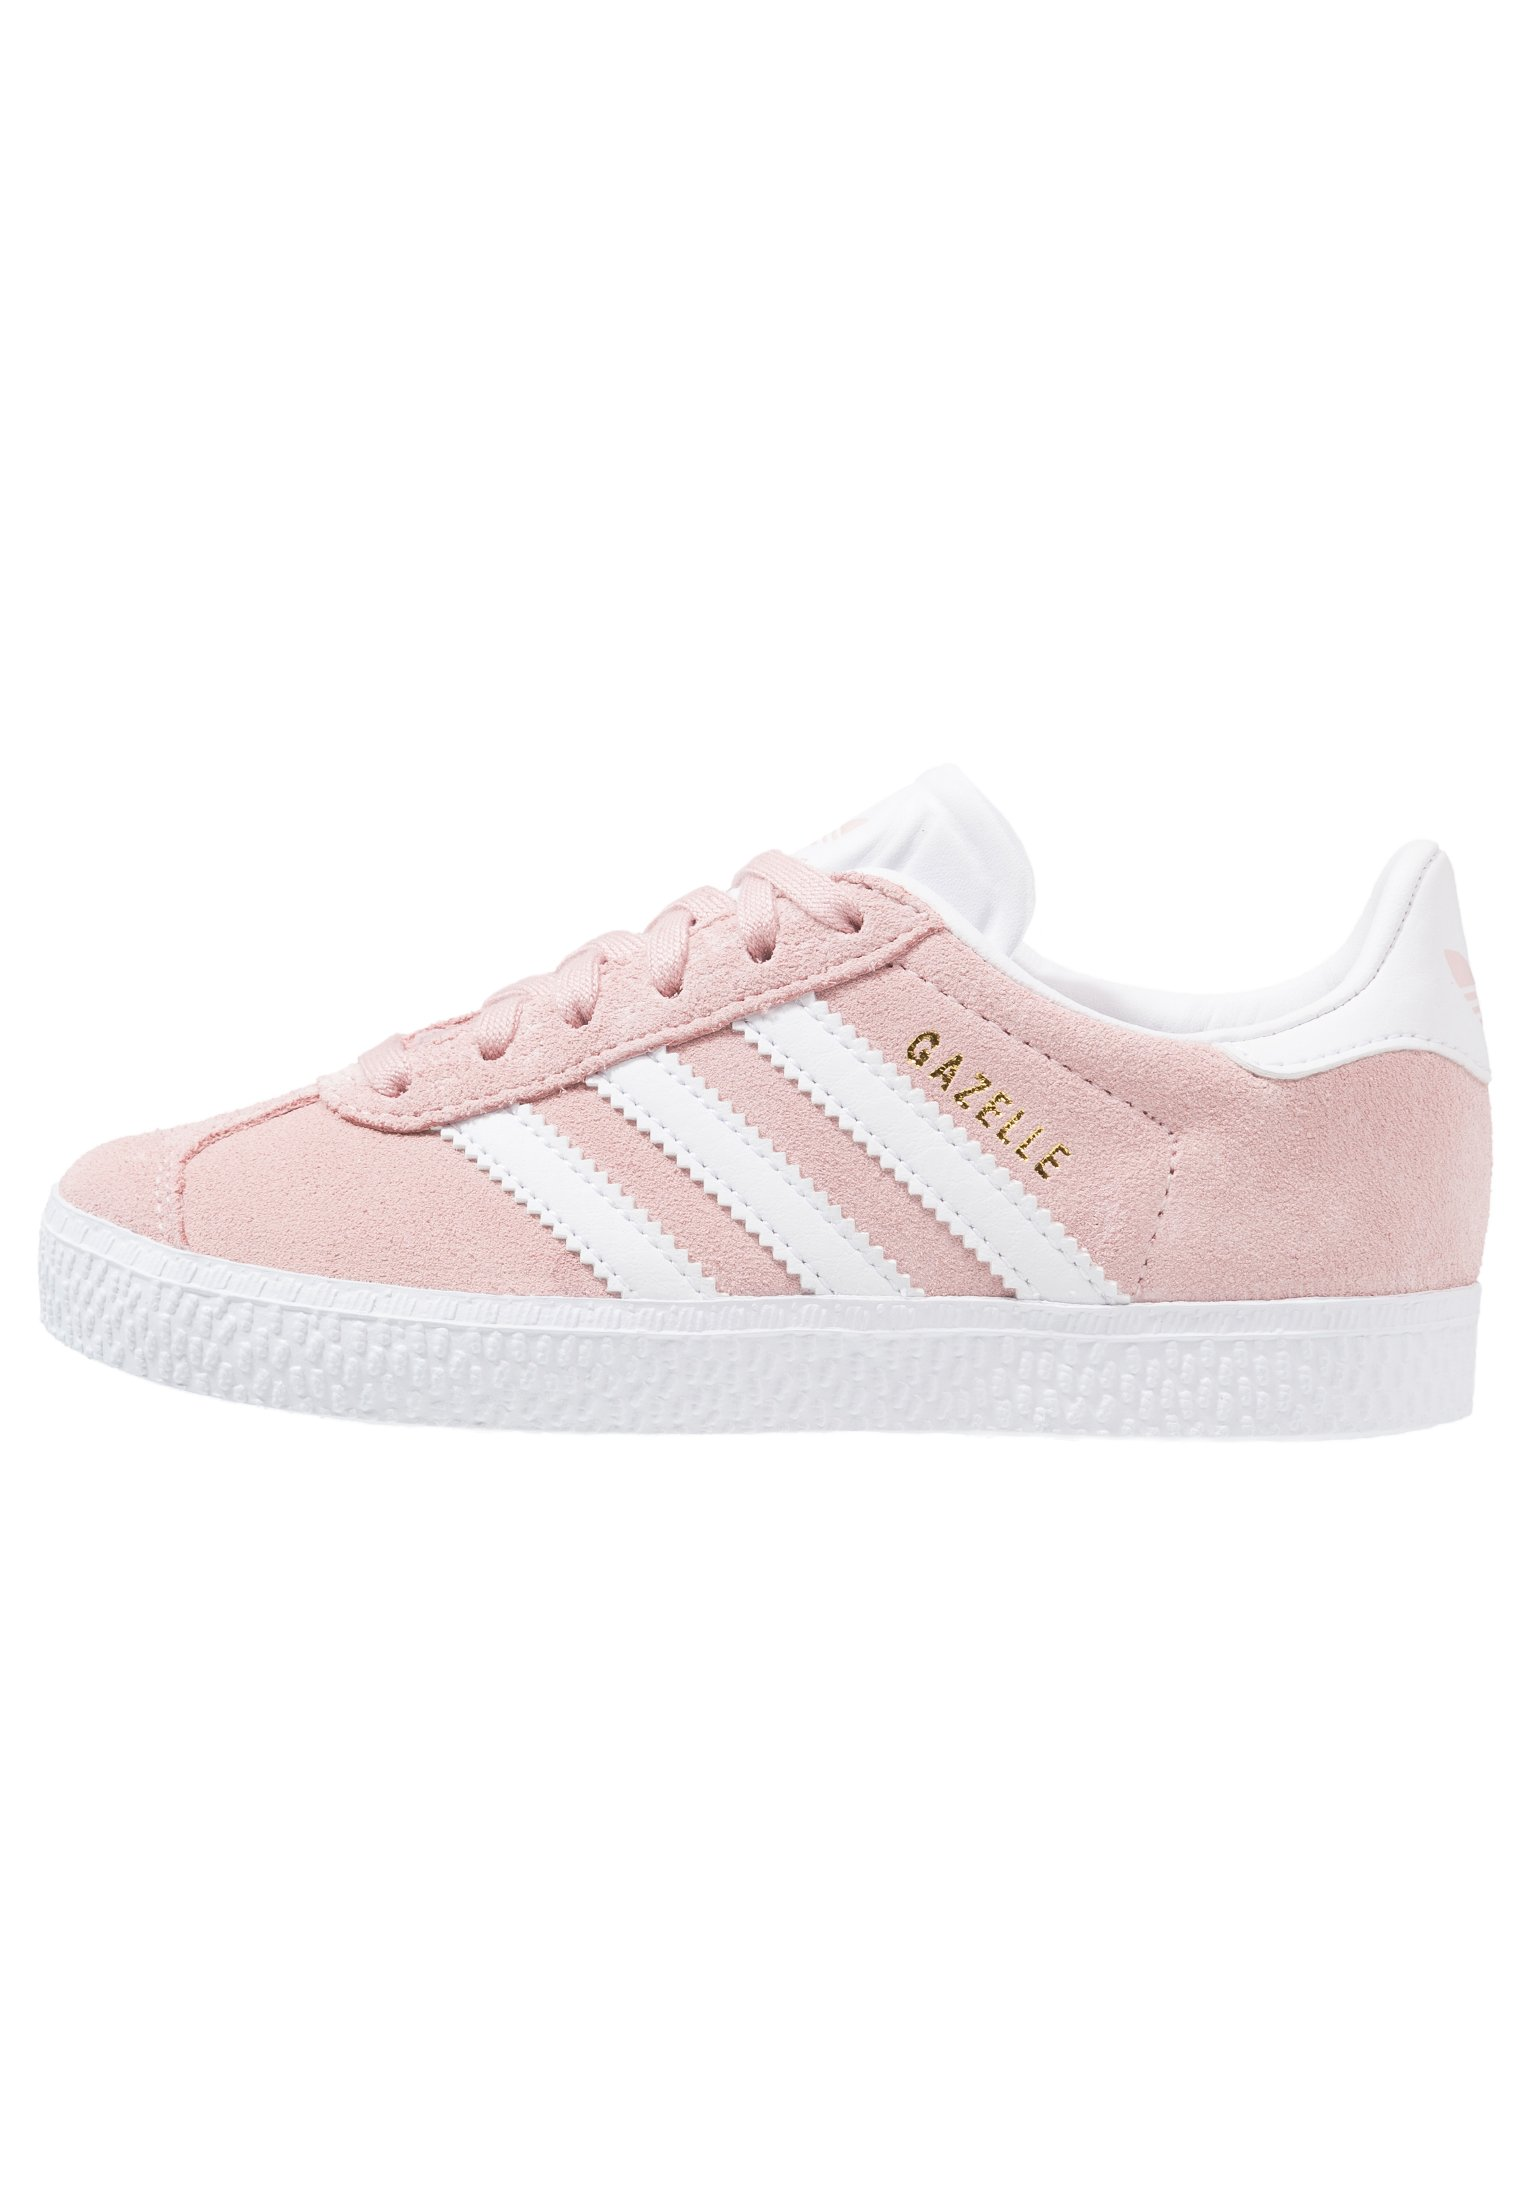 GAZELLE C - Baskets basses - icepink/footwear whitet/gold metallic